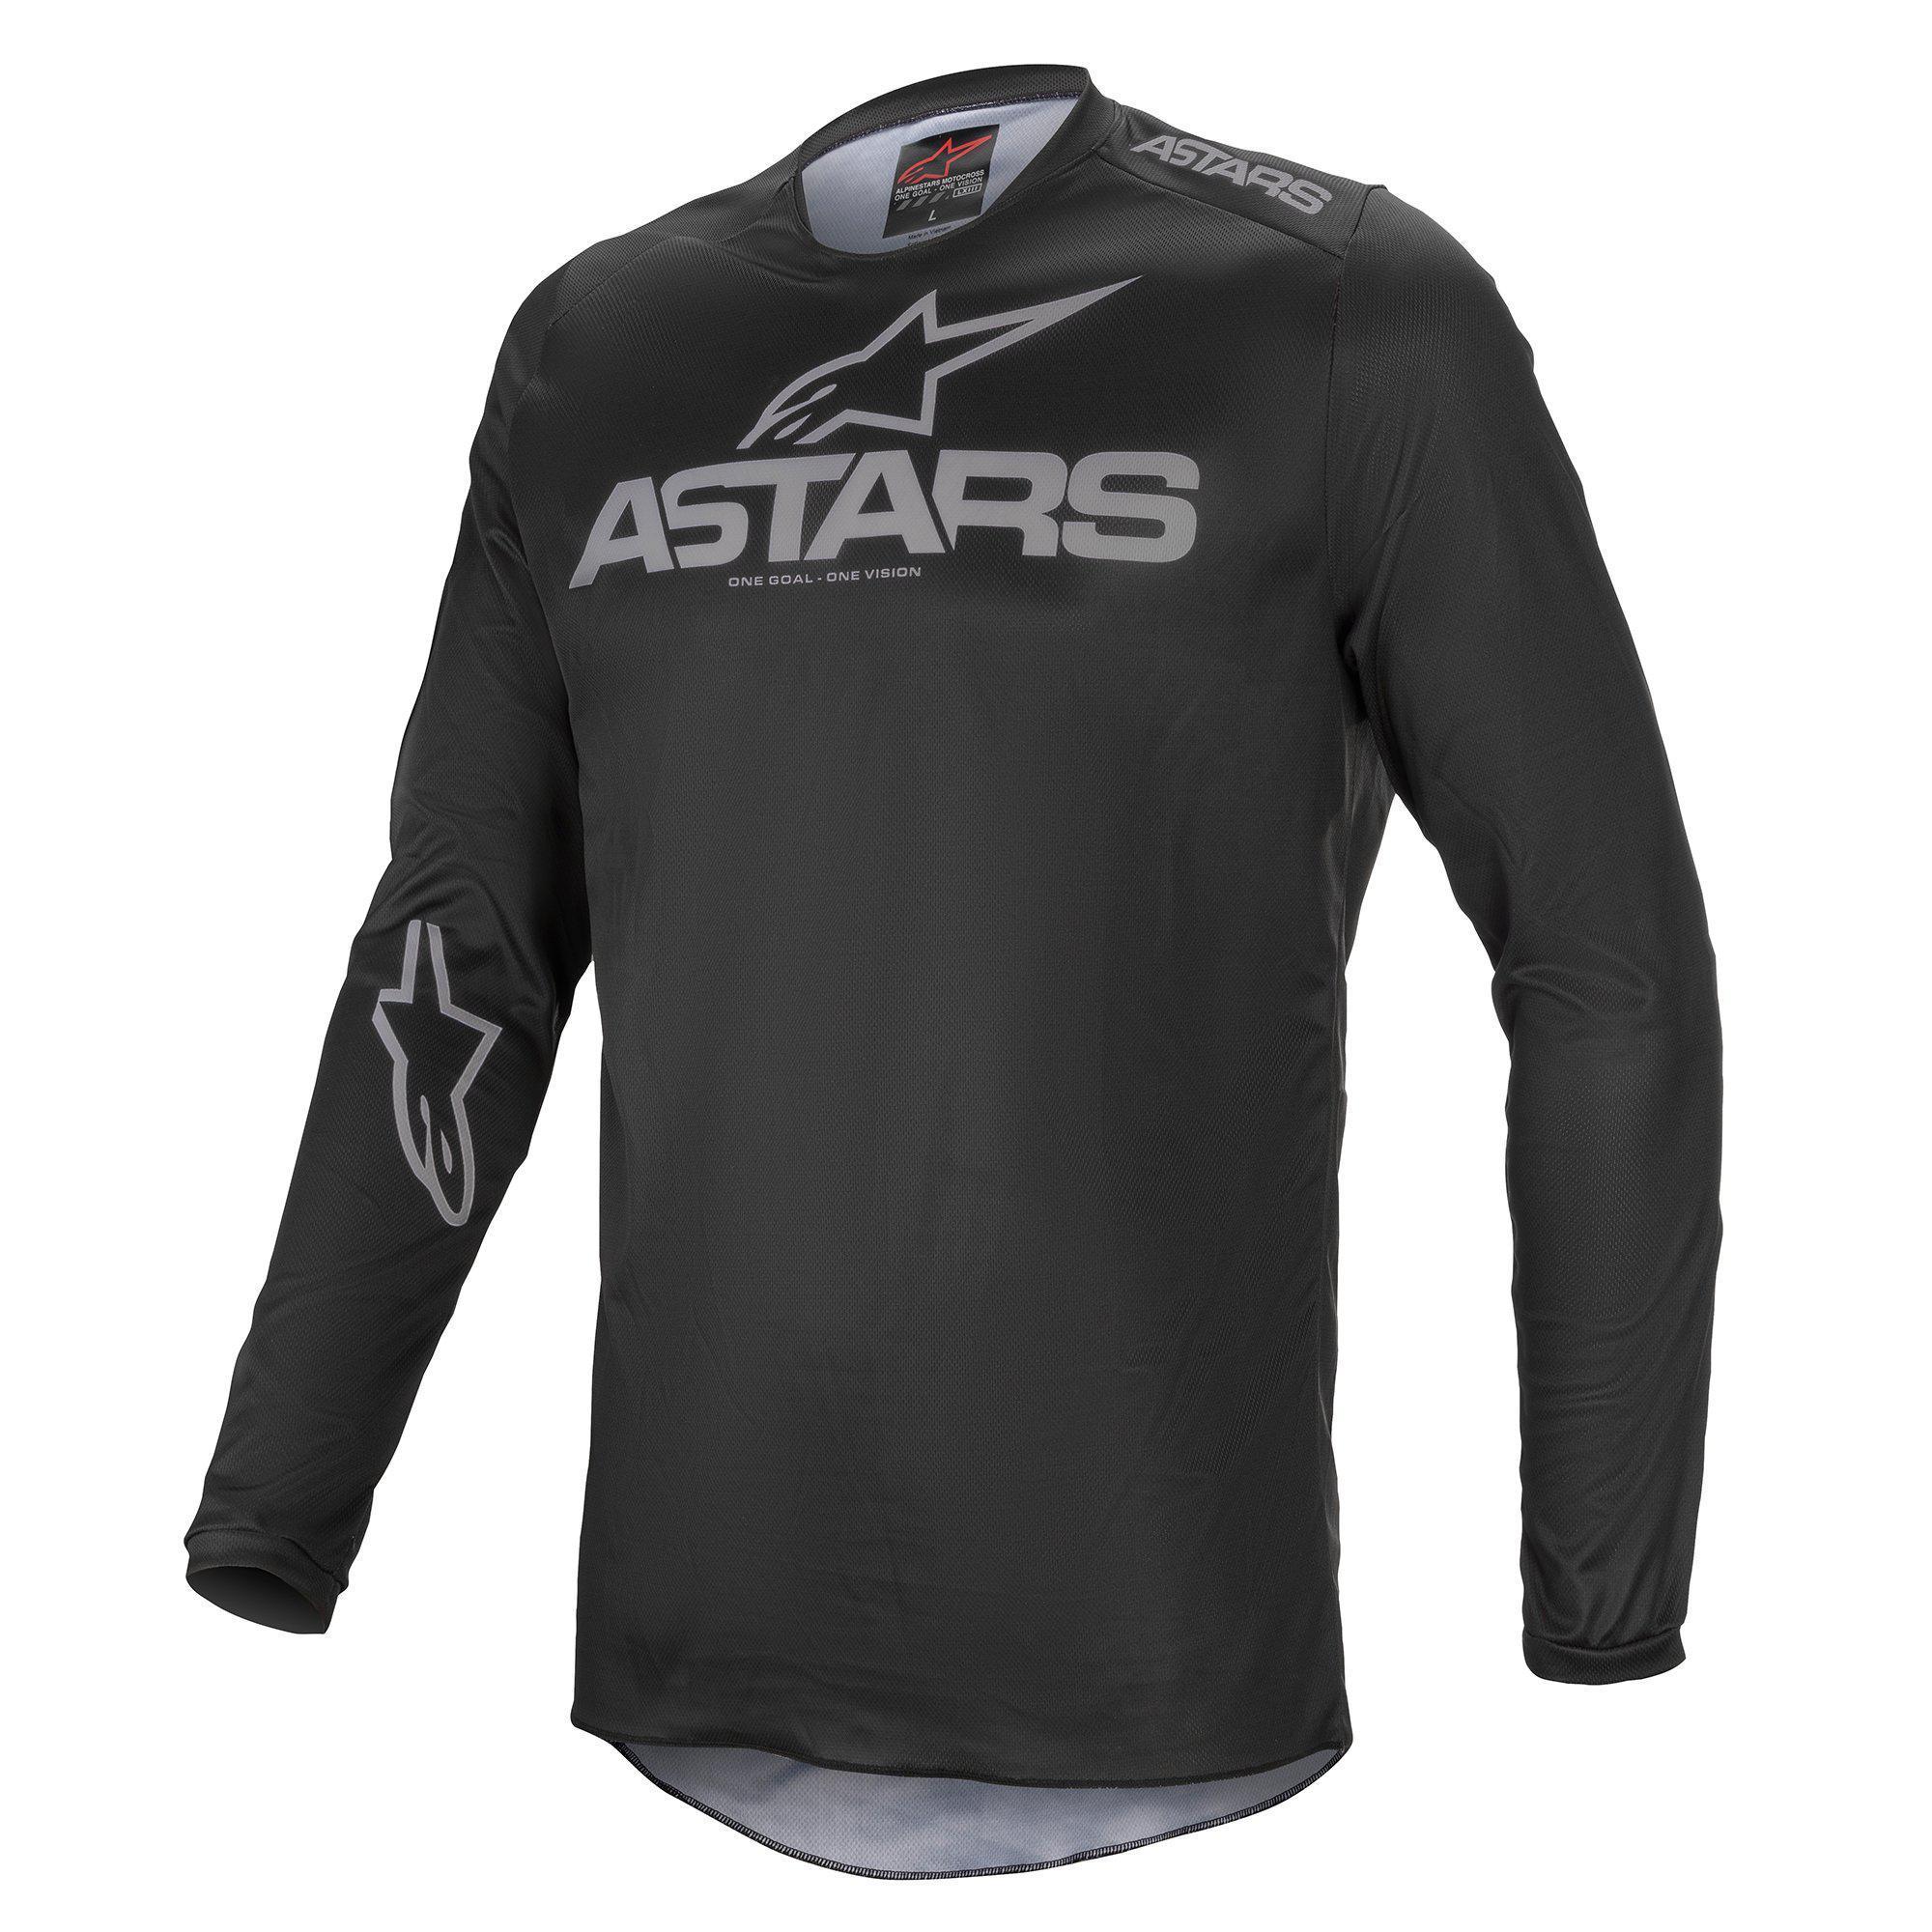 Kit Calça + Camisa Alpinestars Fluid Graphite